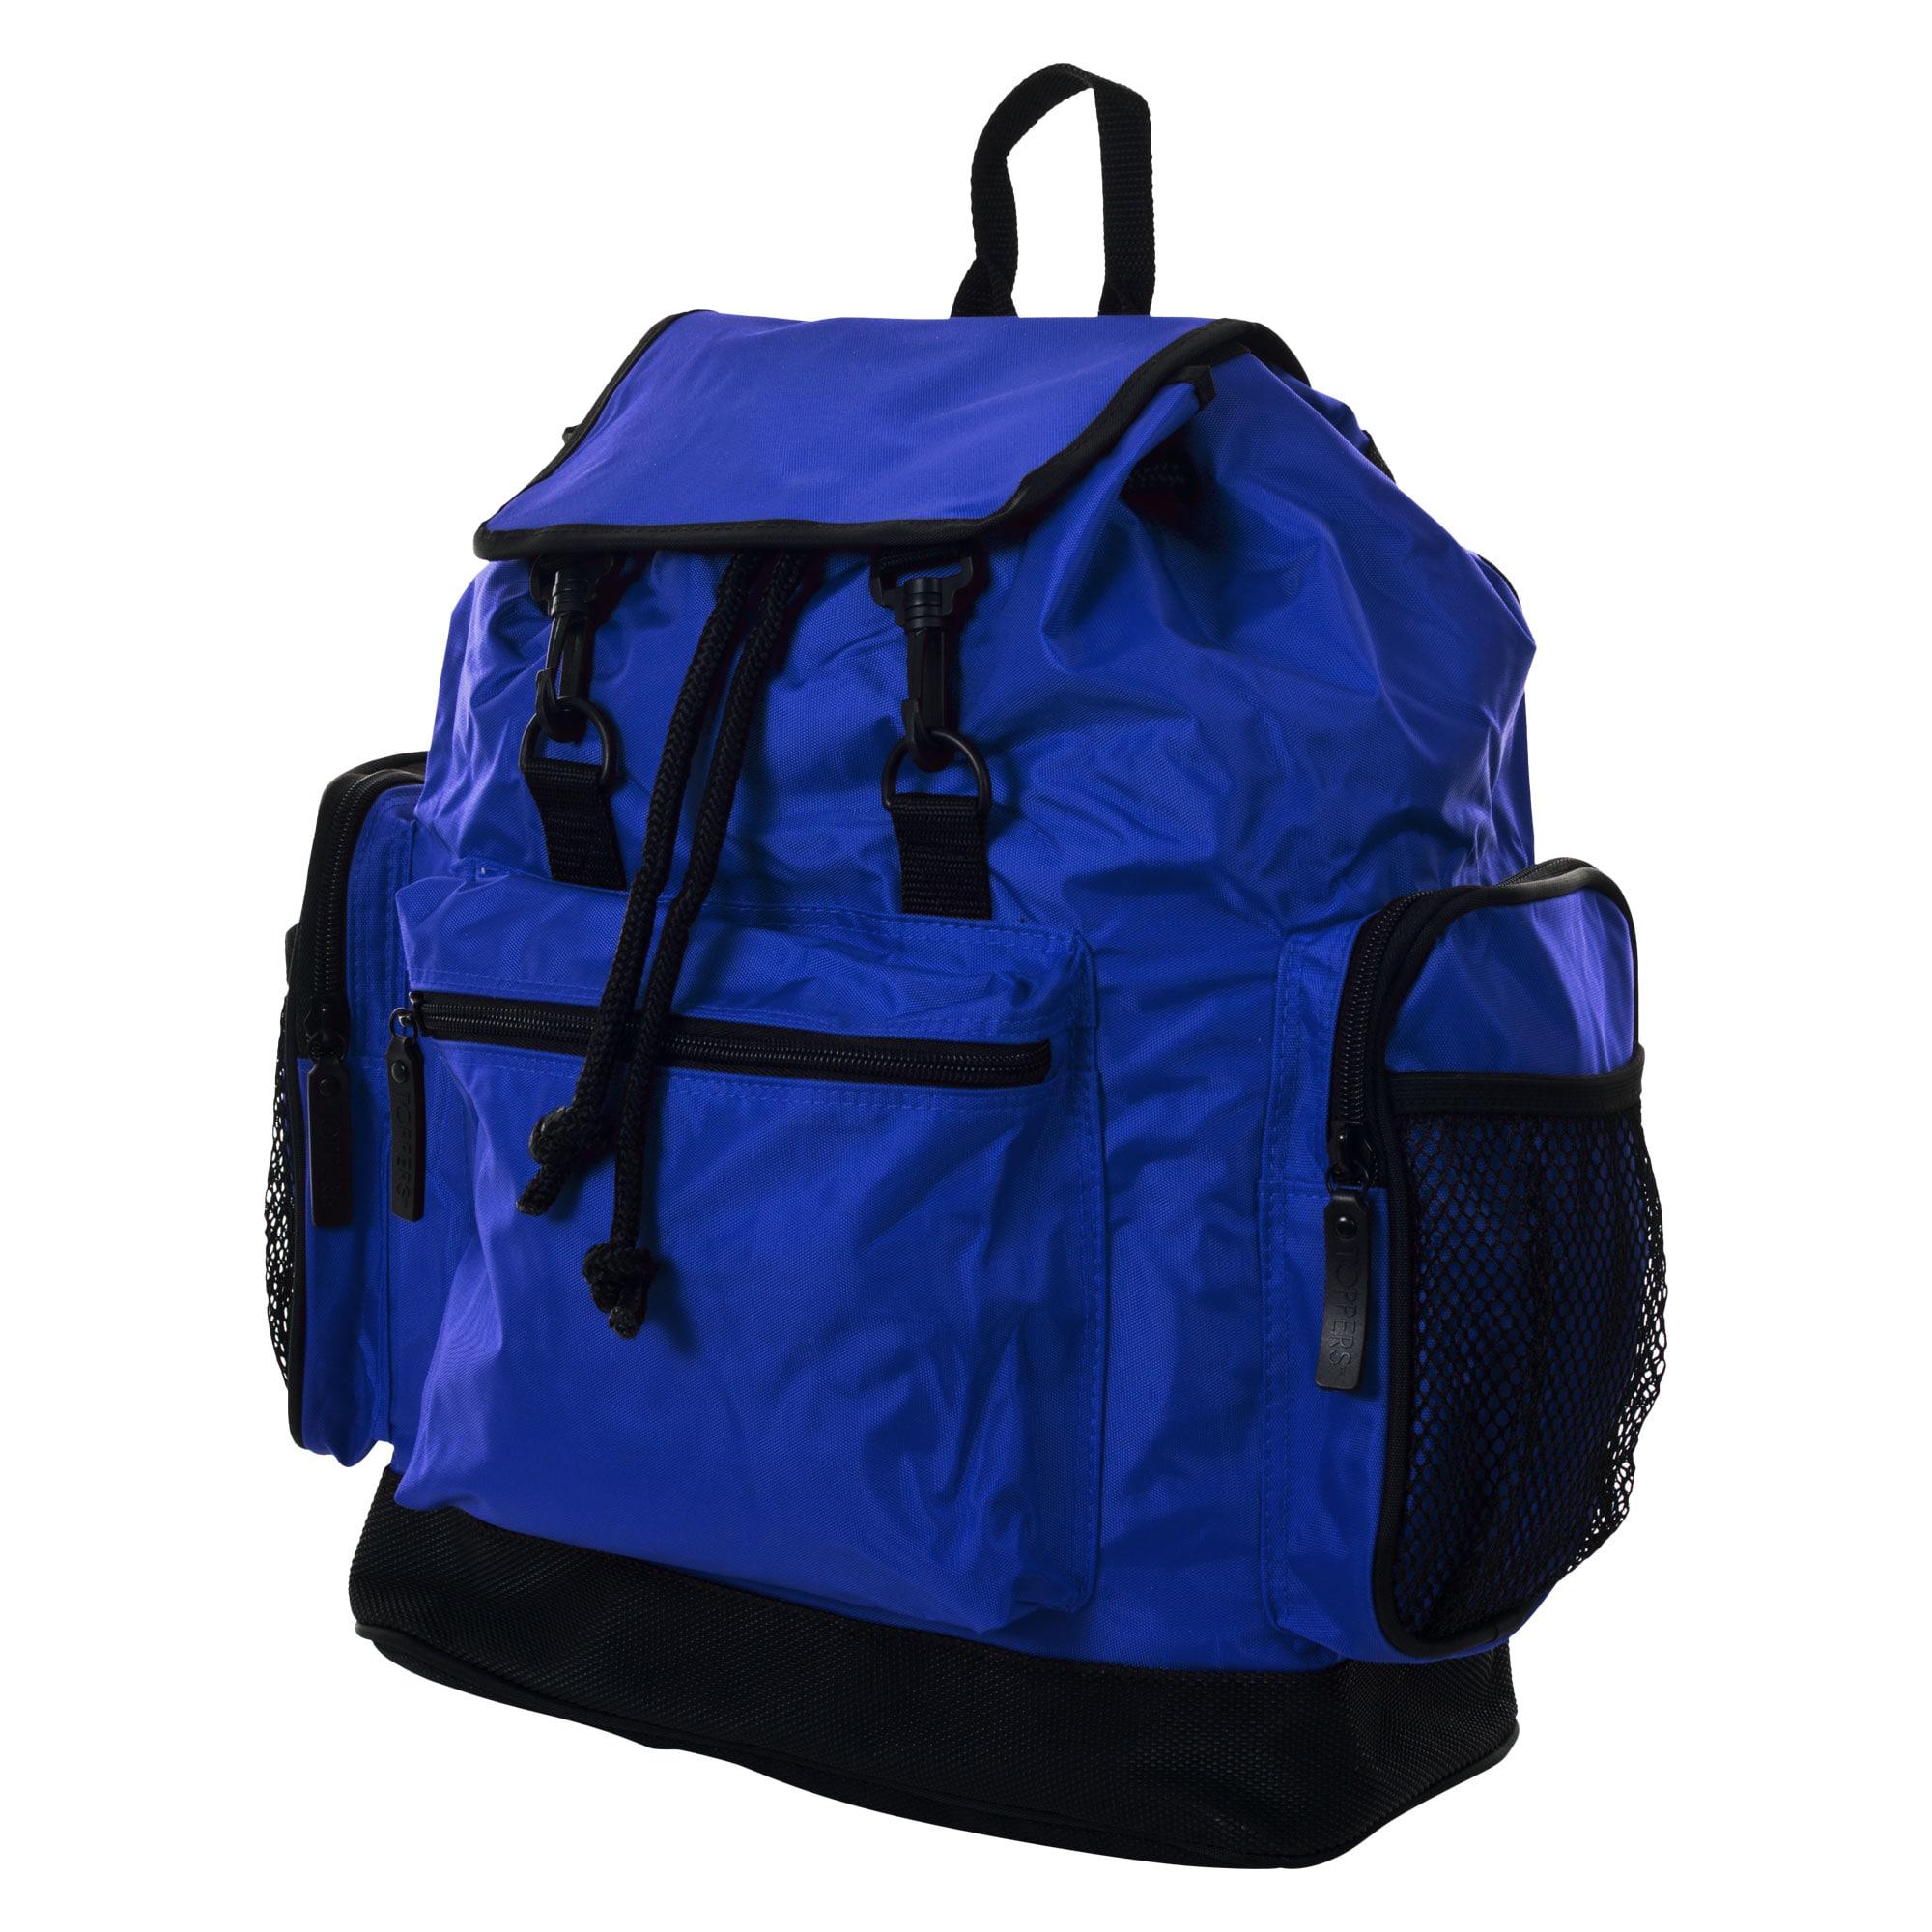 Toppers Avalon Sport Denier-nylon Backpack with Drawstring Opening